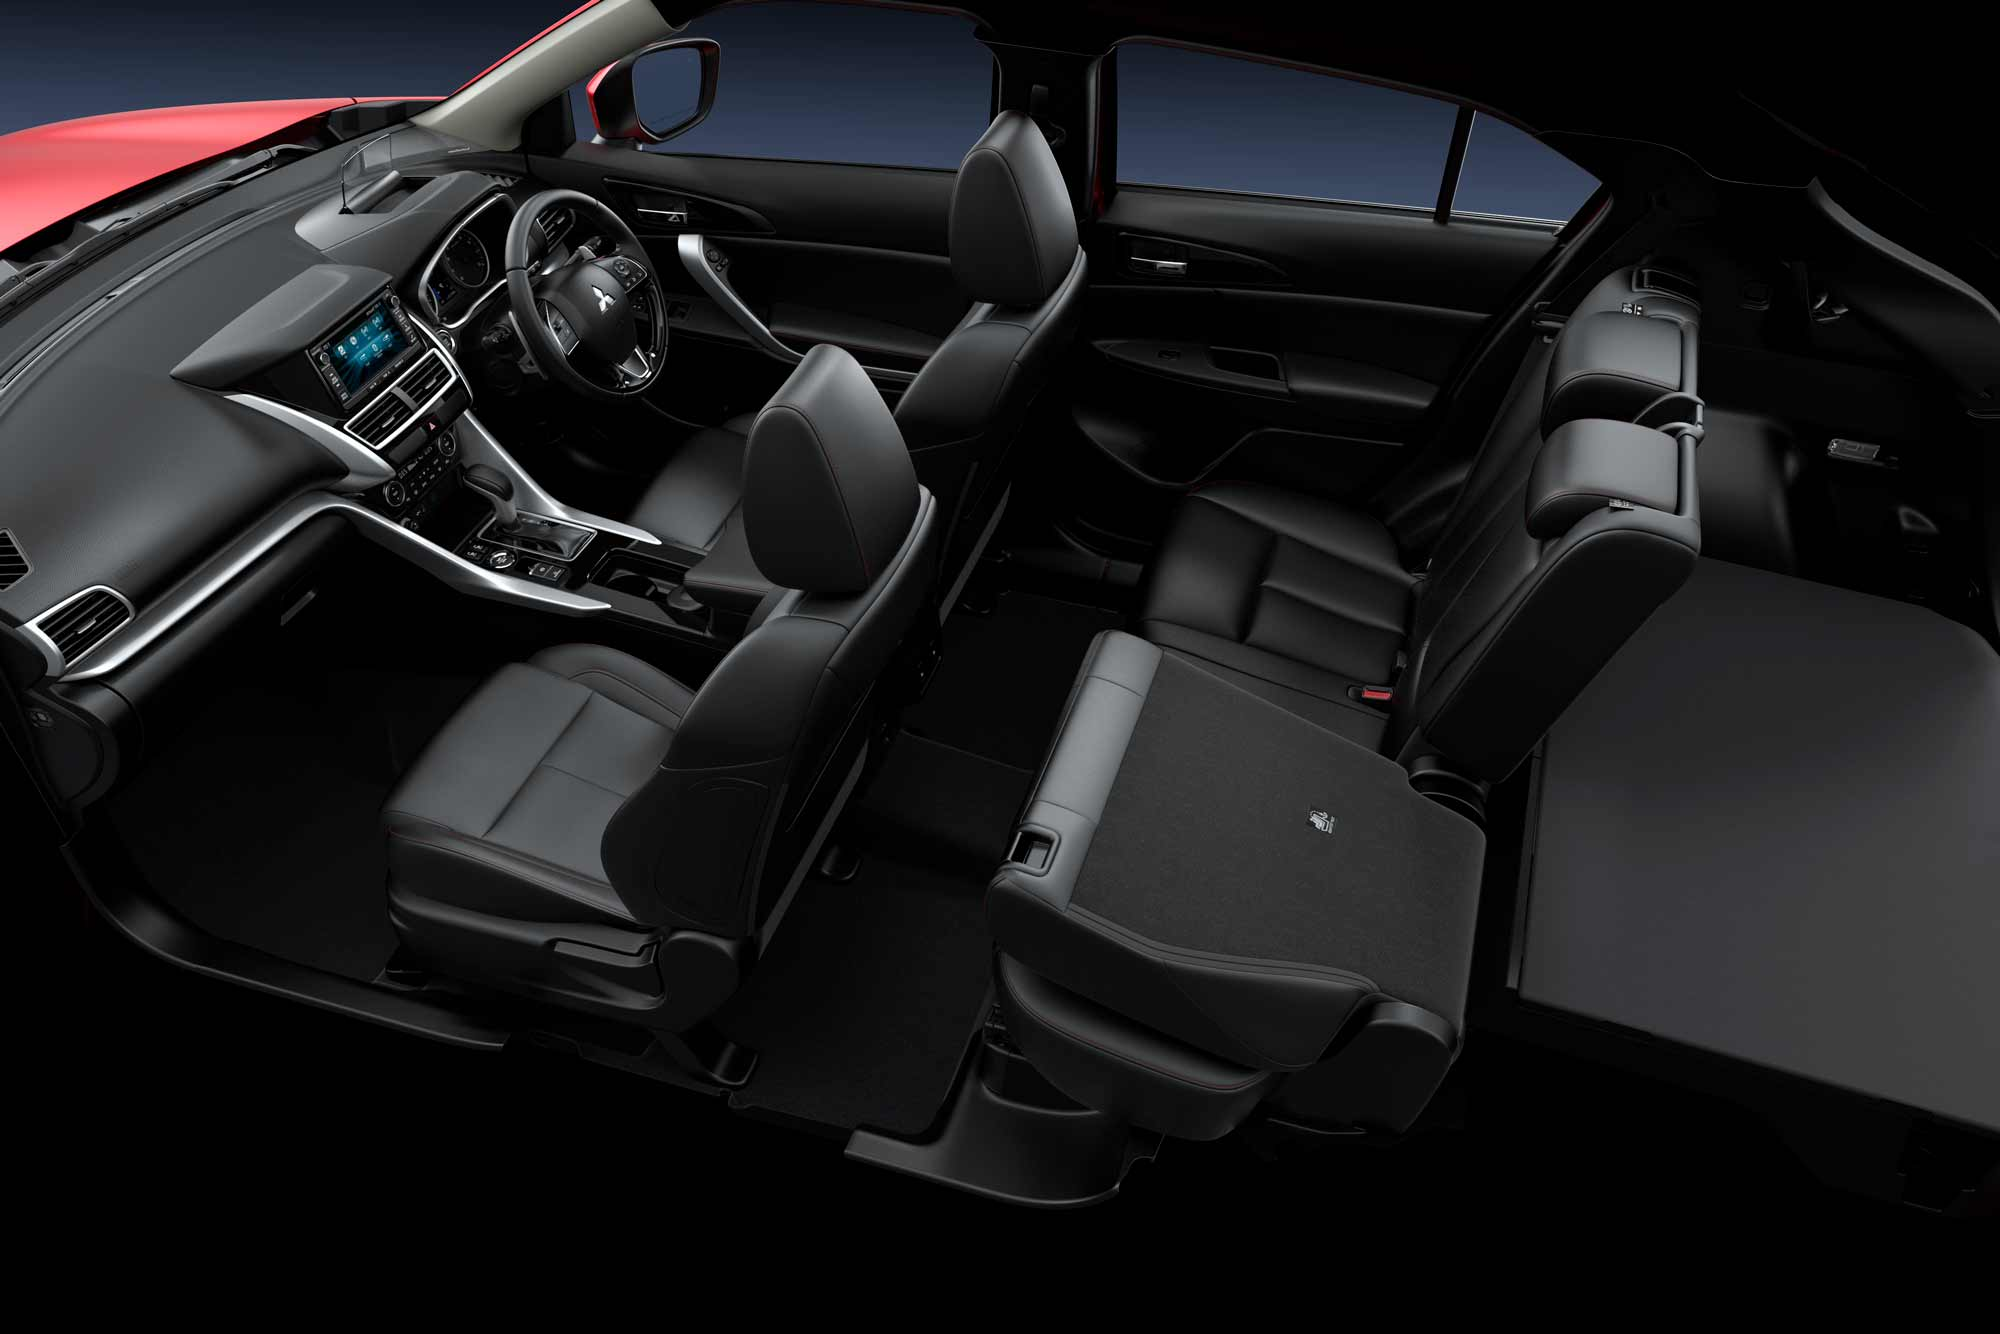 Adjustable Rear Seats